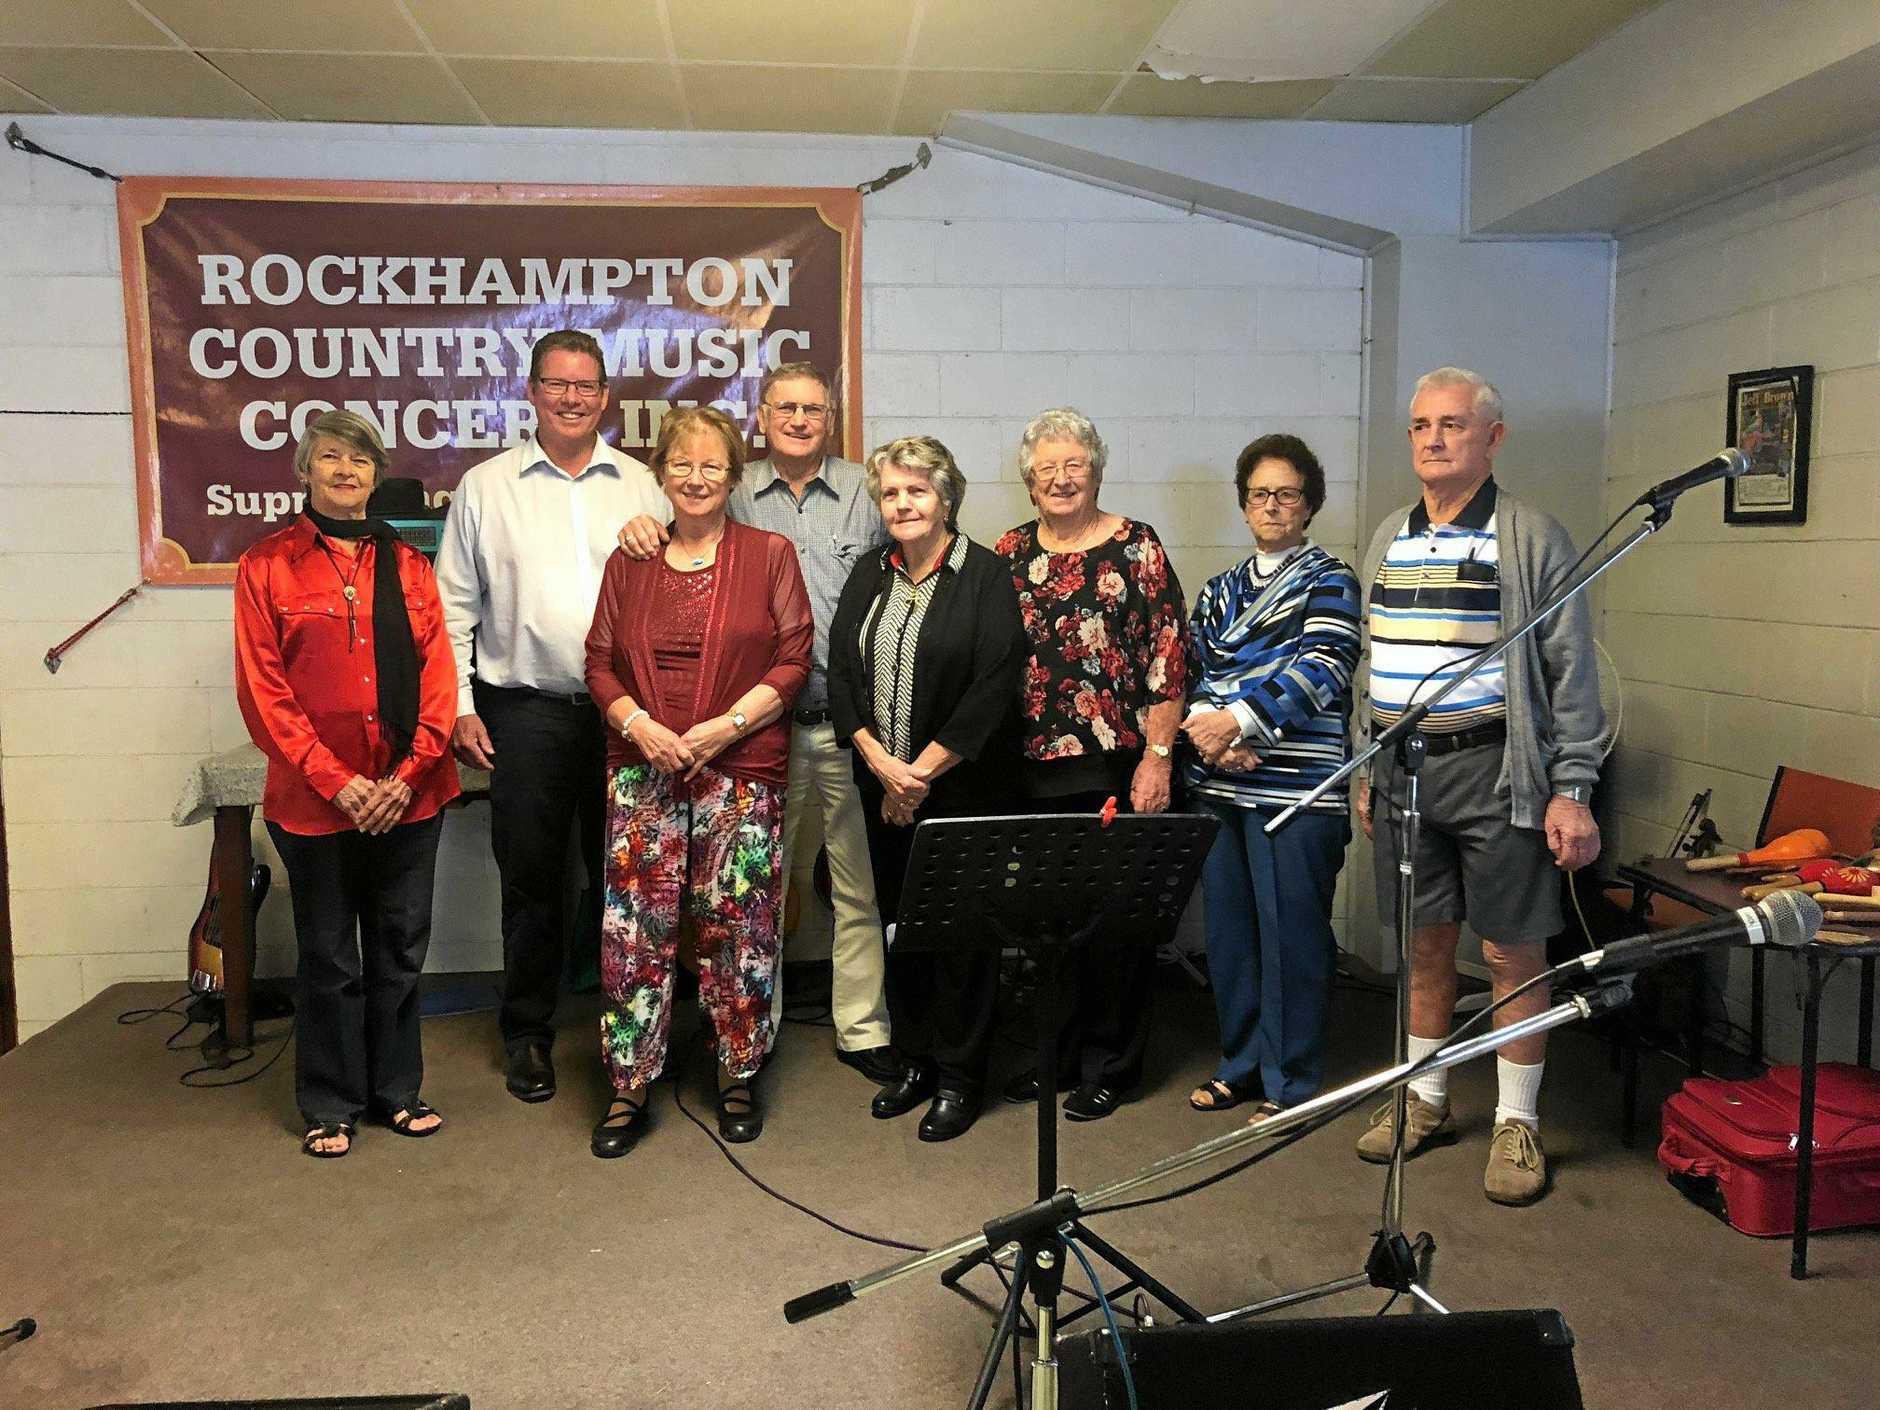 CARING FOR THEIR COMMUNITY: L-R: Elaine Pedersen, Barry O'Rourke, Leanne & Neville Johnson, Dawn Anderson, Nell Healy, Bev & Len Harris